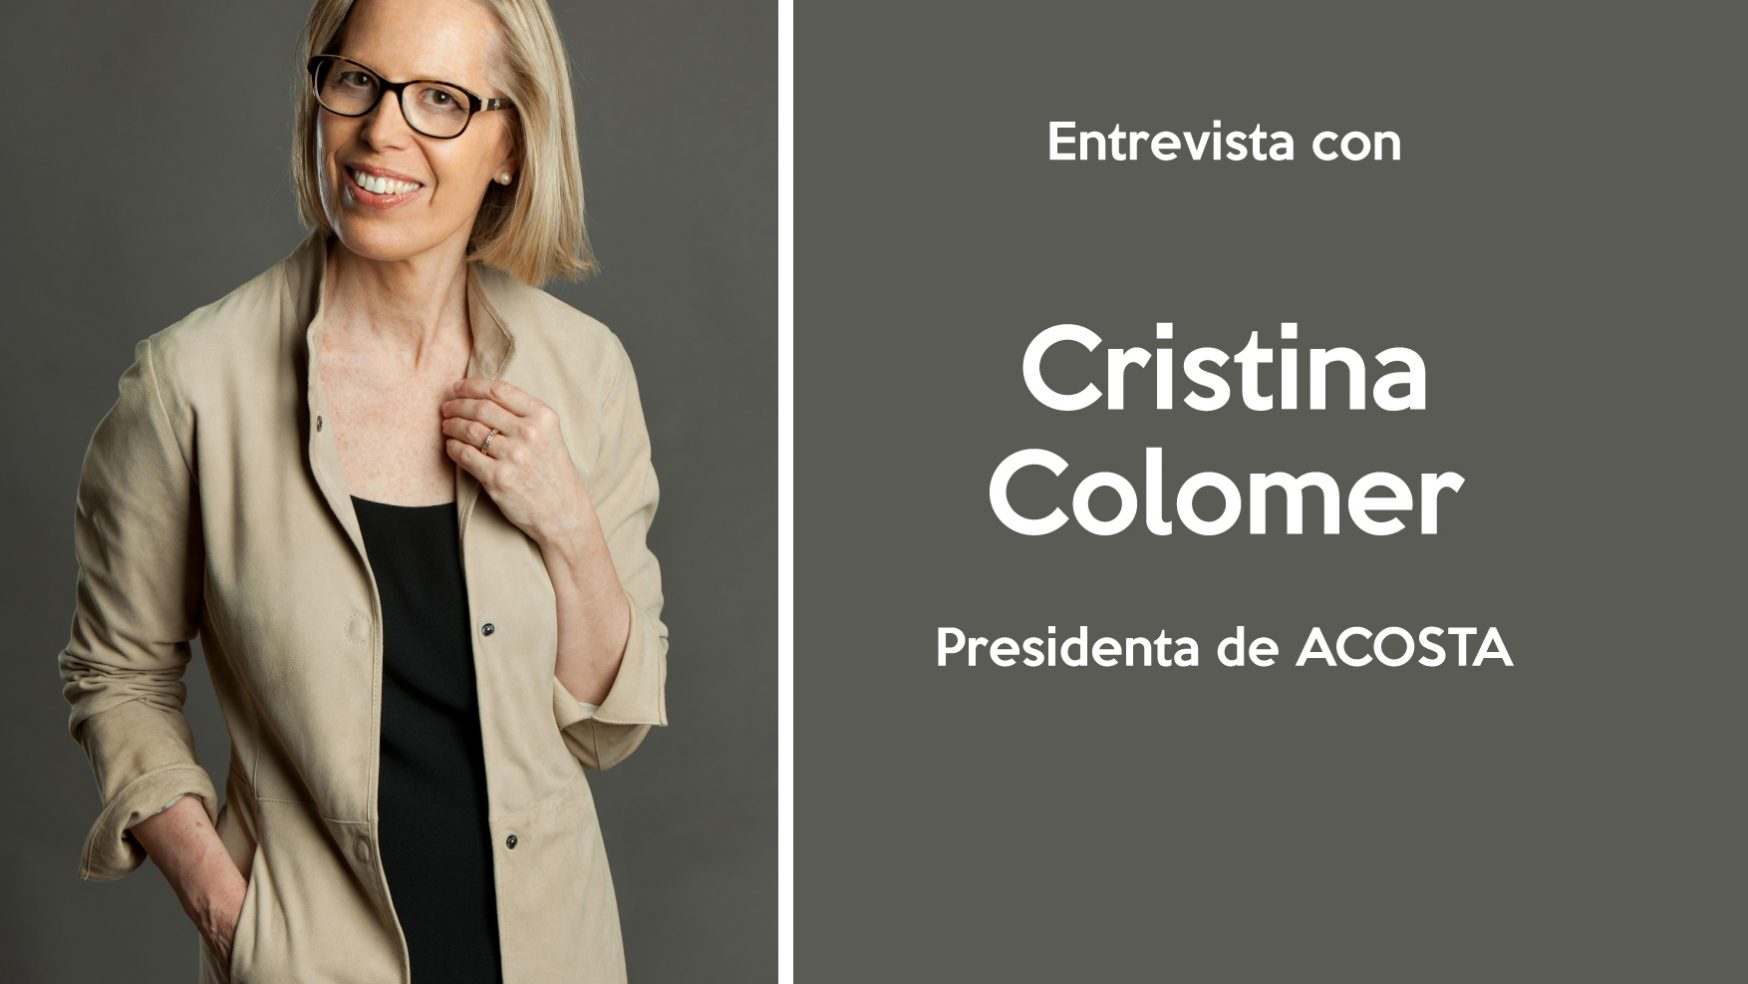 «La mejor Empresa es la Familia» Entrevista a Cristina Colomer, presidenta de ACOSTA